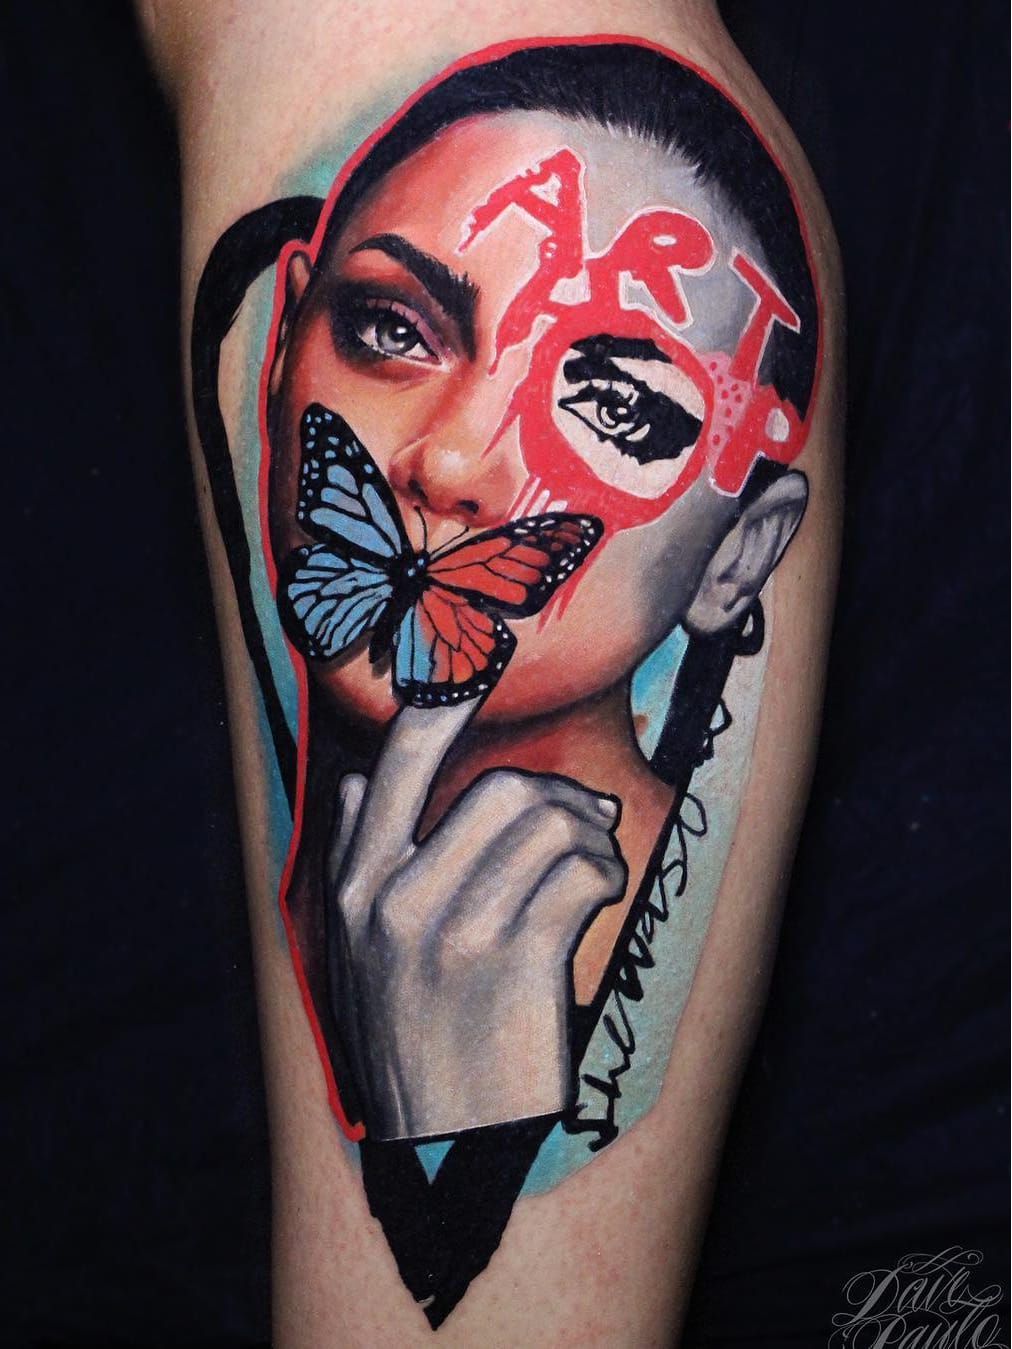 #DavePaulo #gringo #realismo #realism #colorido #colorful #portrait #retrato #colagem #collage #woman #mulher #hand #mao #borboleta #butterfly #pretoecinza #blackandgrey